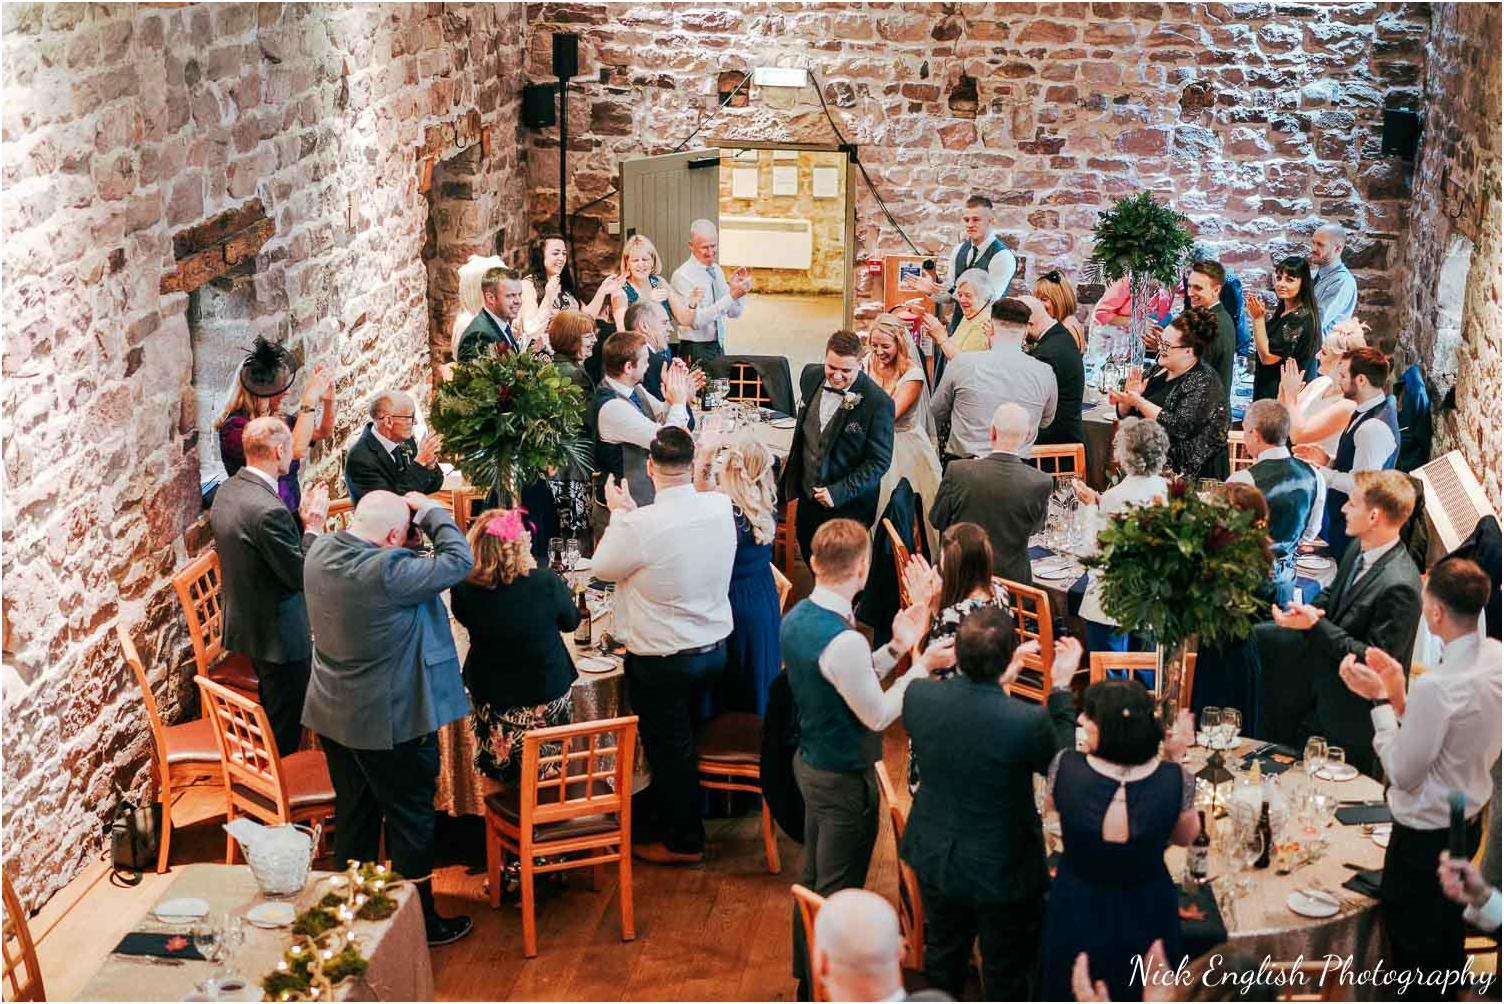 The_Ashes_Barn_Endon_Stoke_Wedding_Photographer-97.jpg